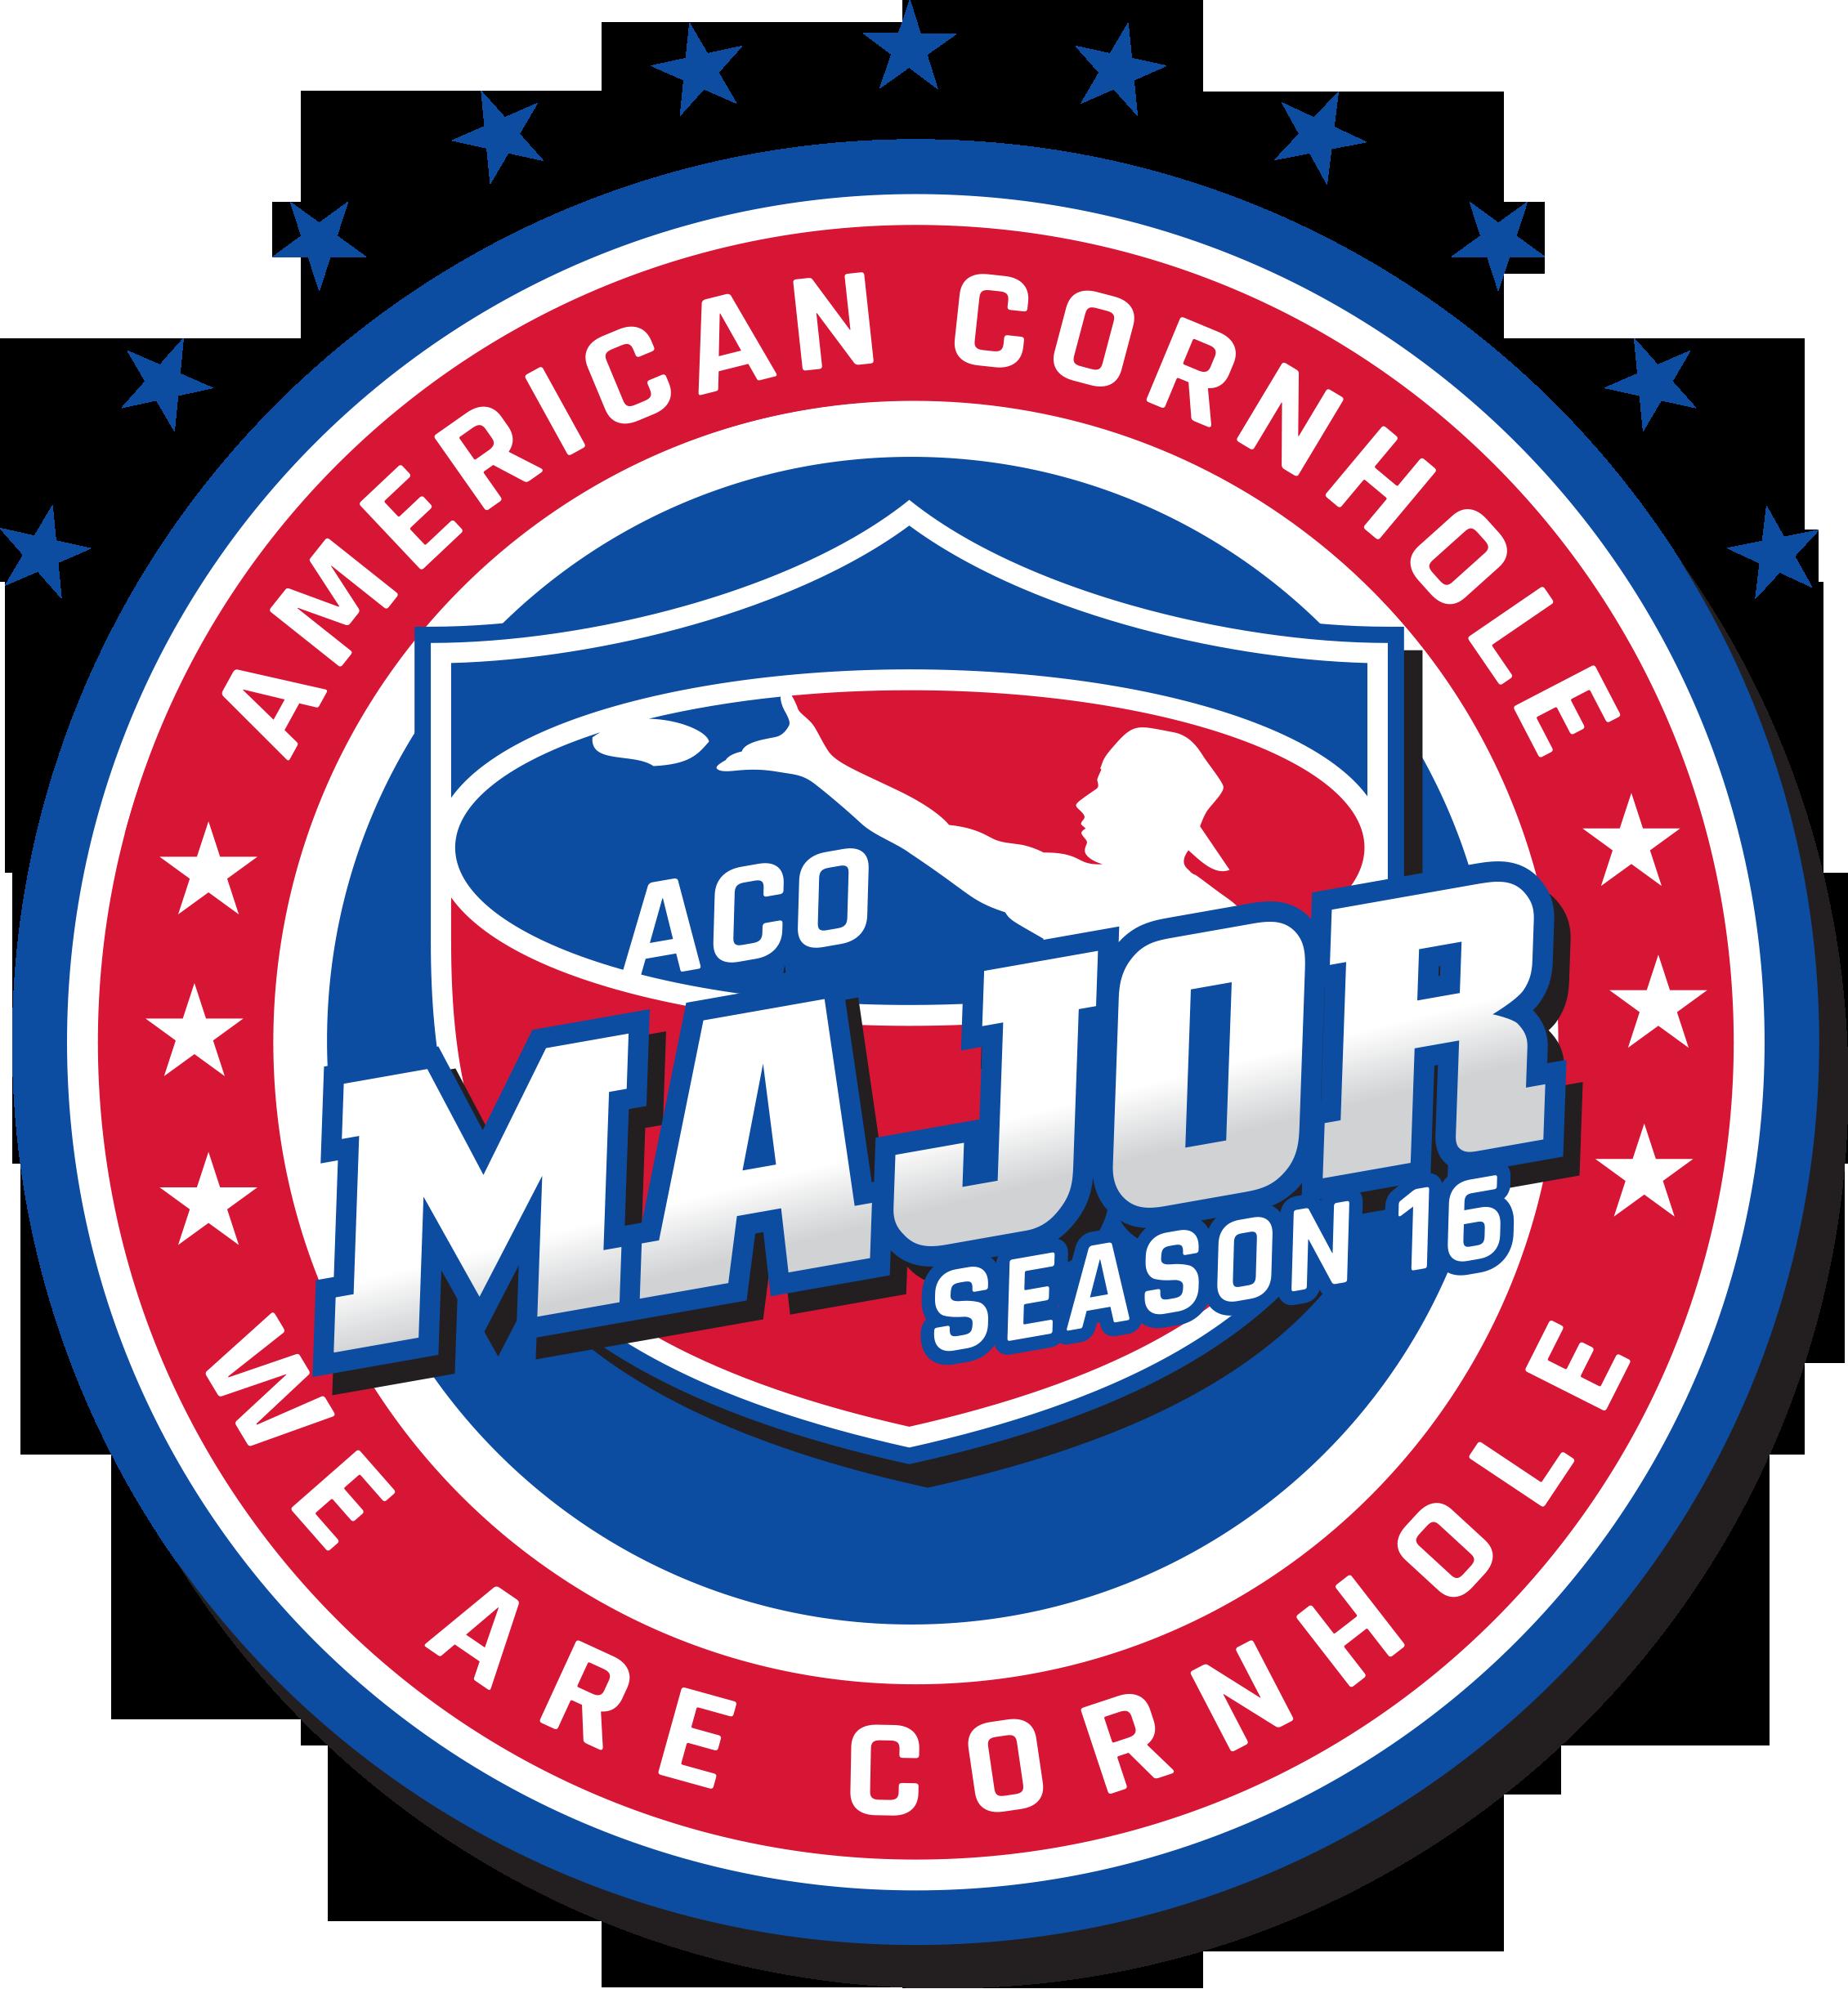 aco, american cornhole organization, sweet 16, season 16, north platte, ne, nebraska, great north conference, bag toss, 308 cornhole